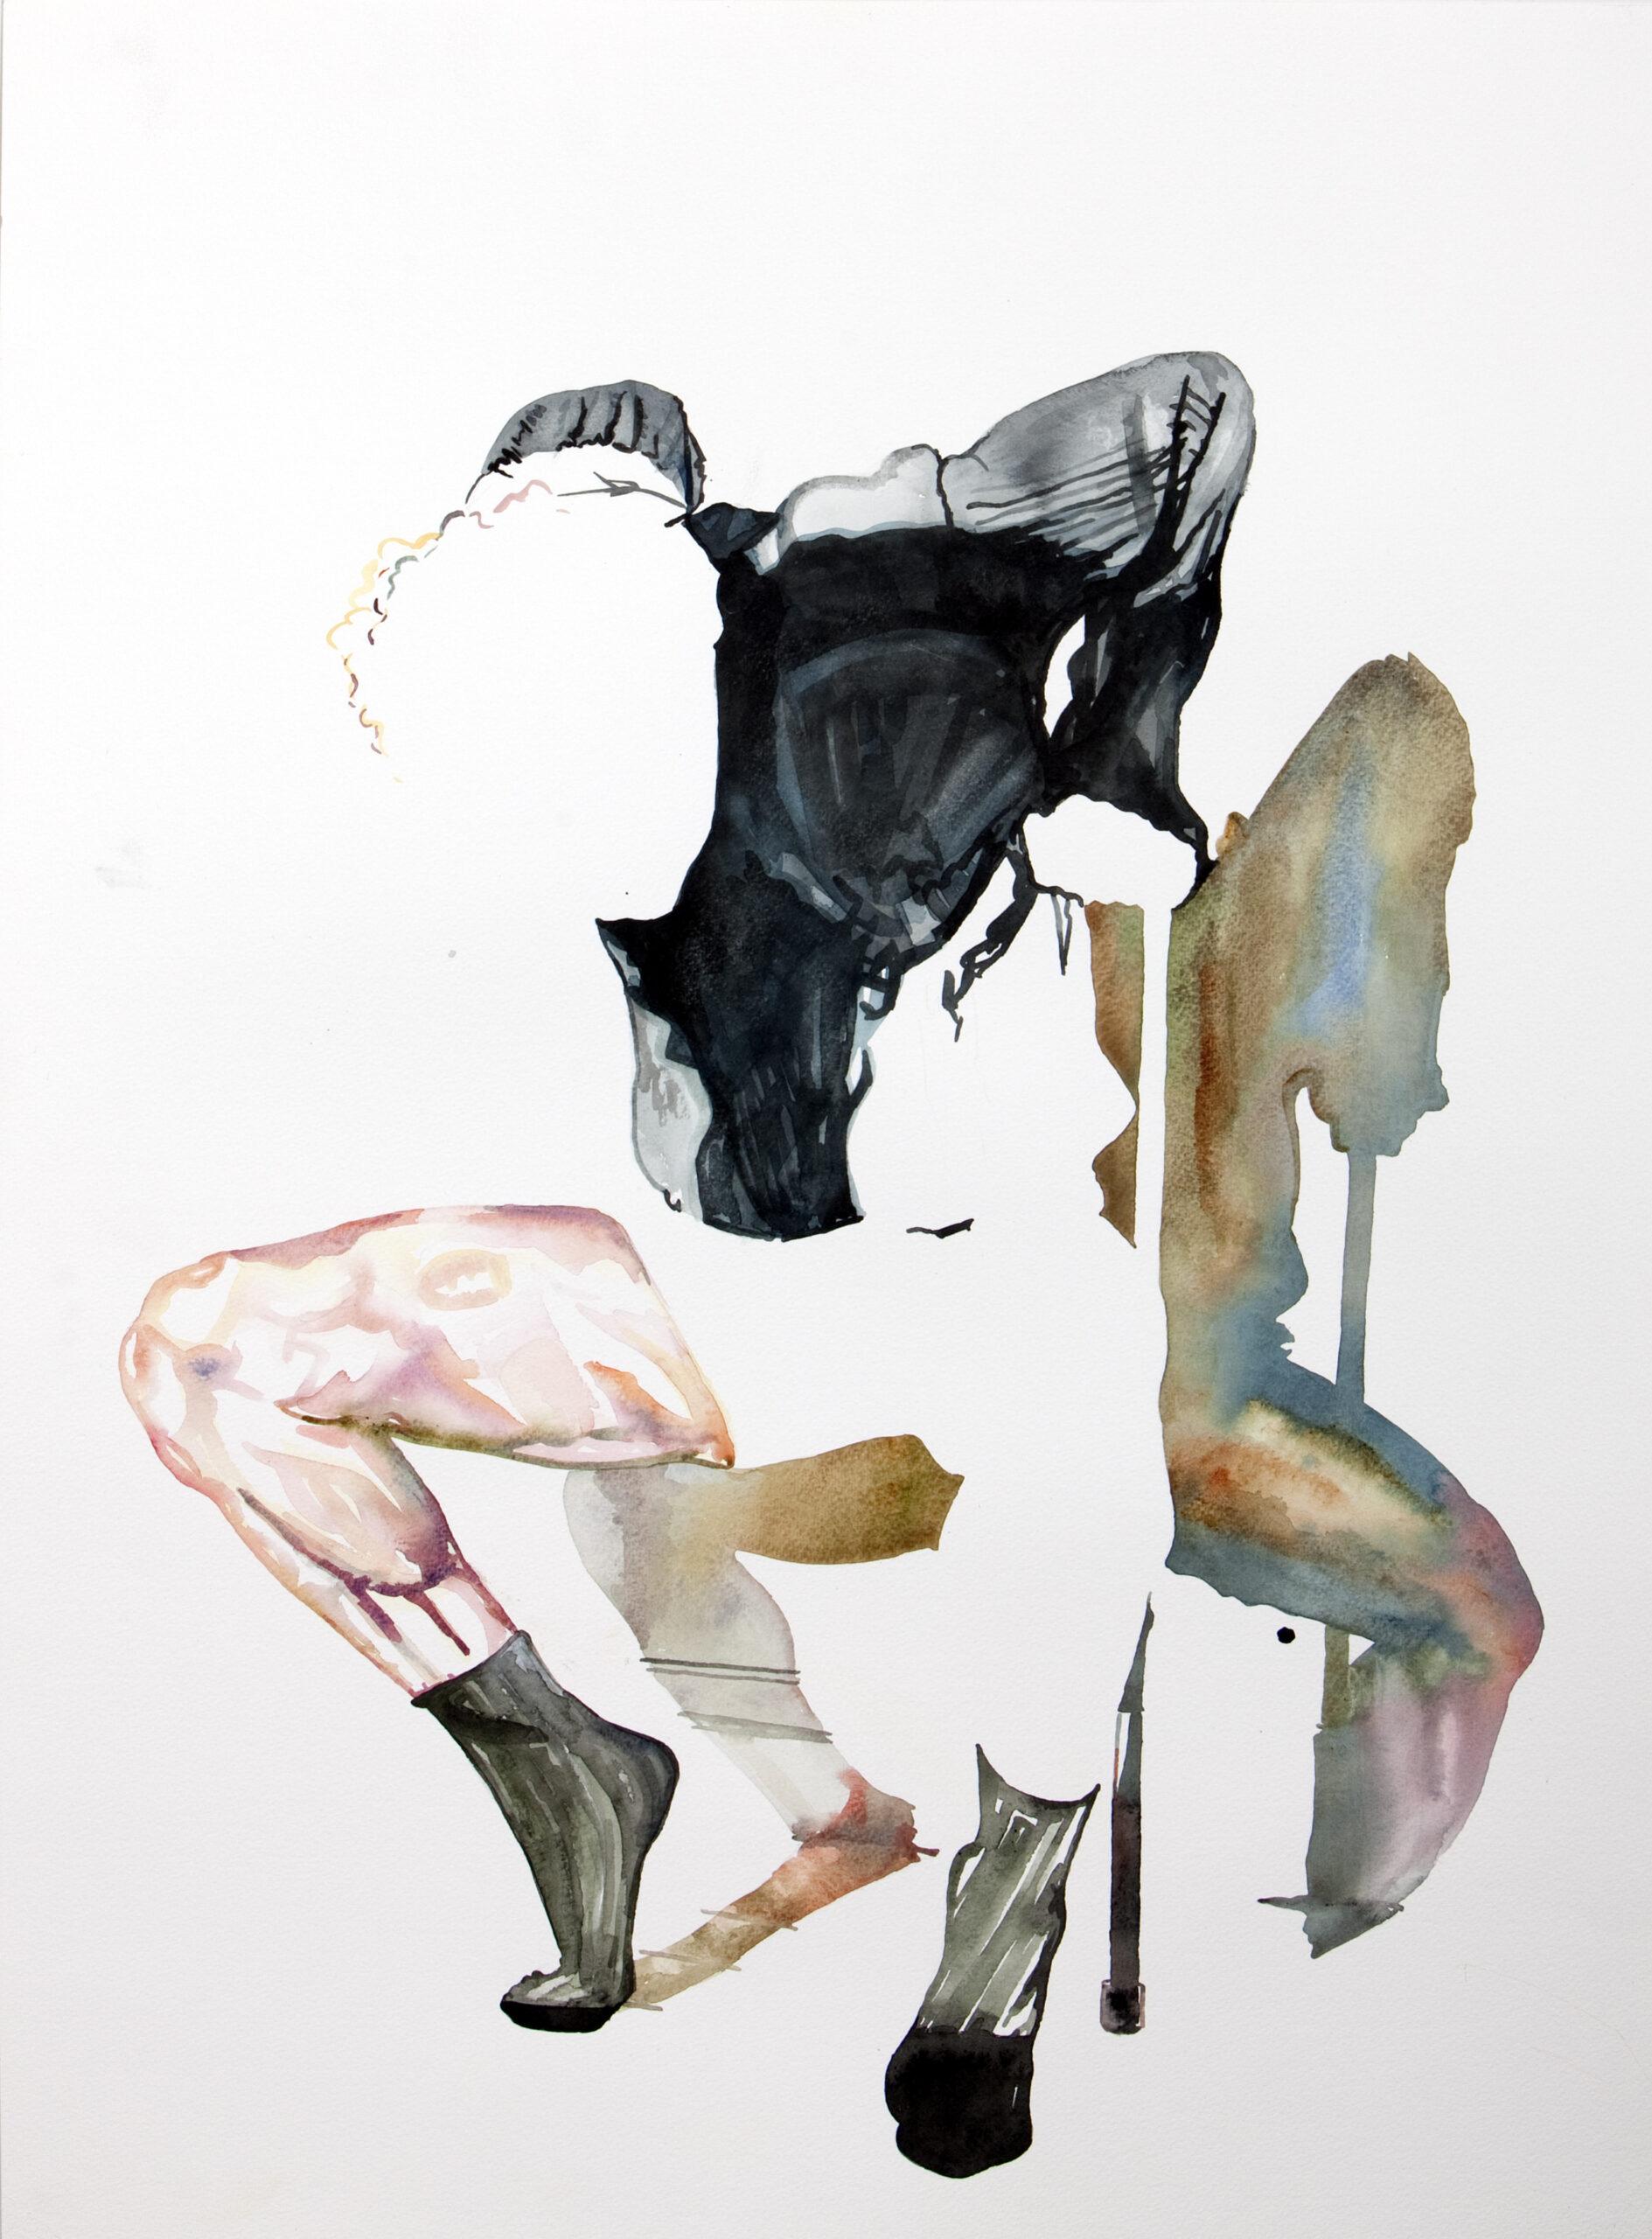 Wouter van de Koot drawing watercolour crouching man dancer socks